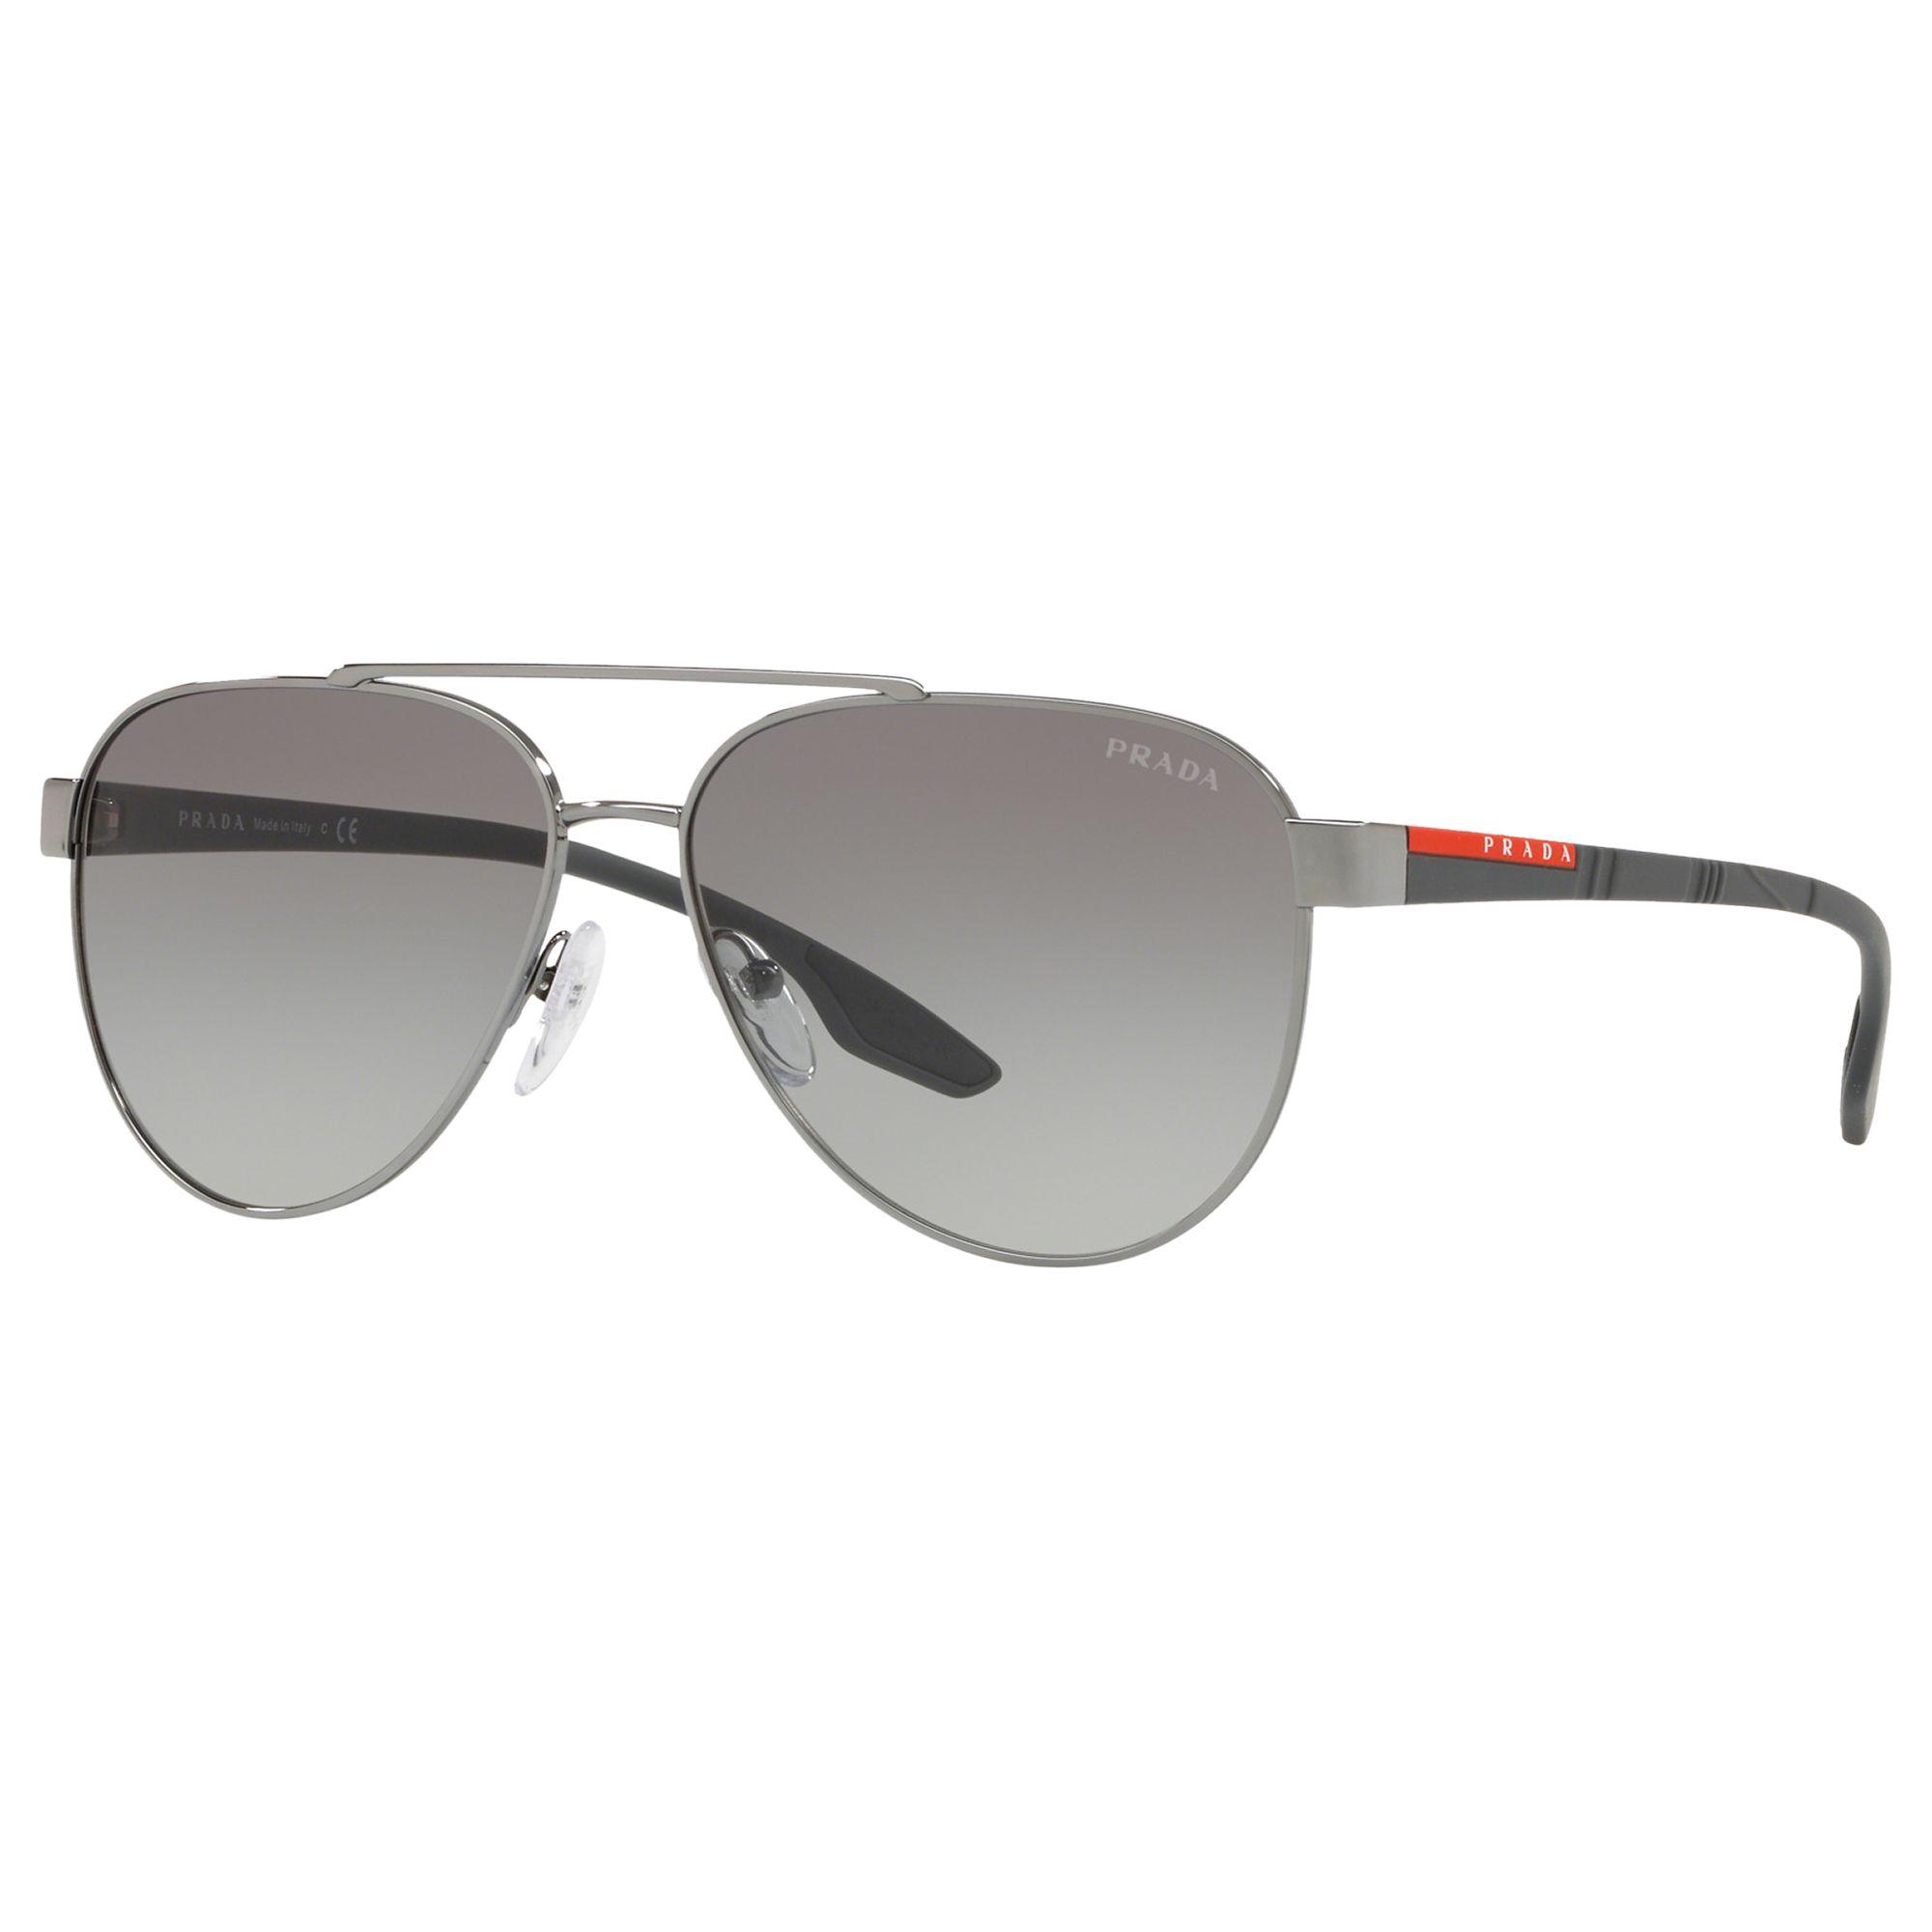 7f615f18195 ... 50% off prada linea rossa ps 54ts mens aviator sunglasses gunmetal grey  gradient at john